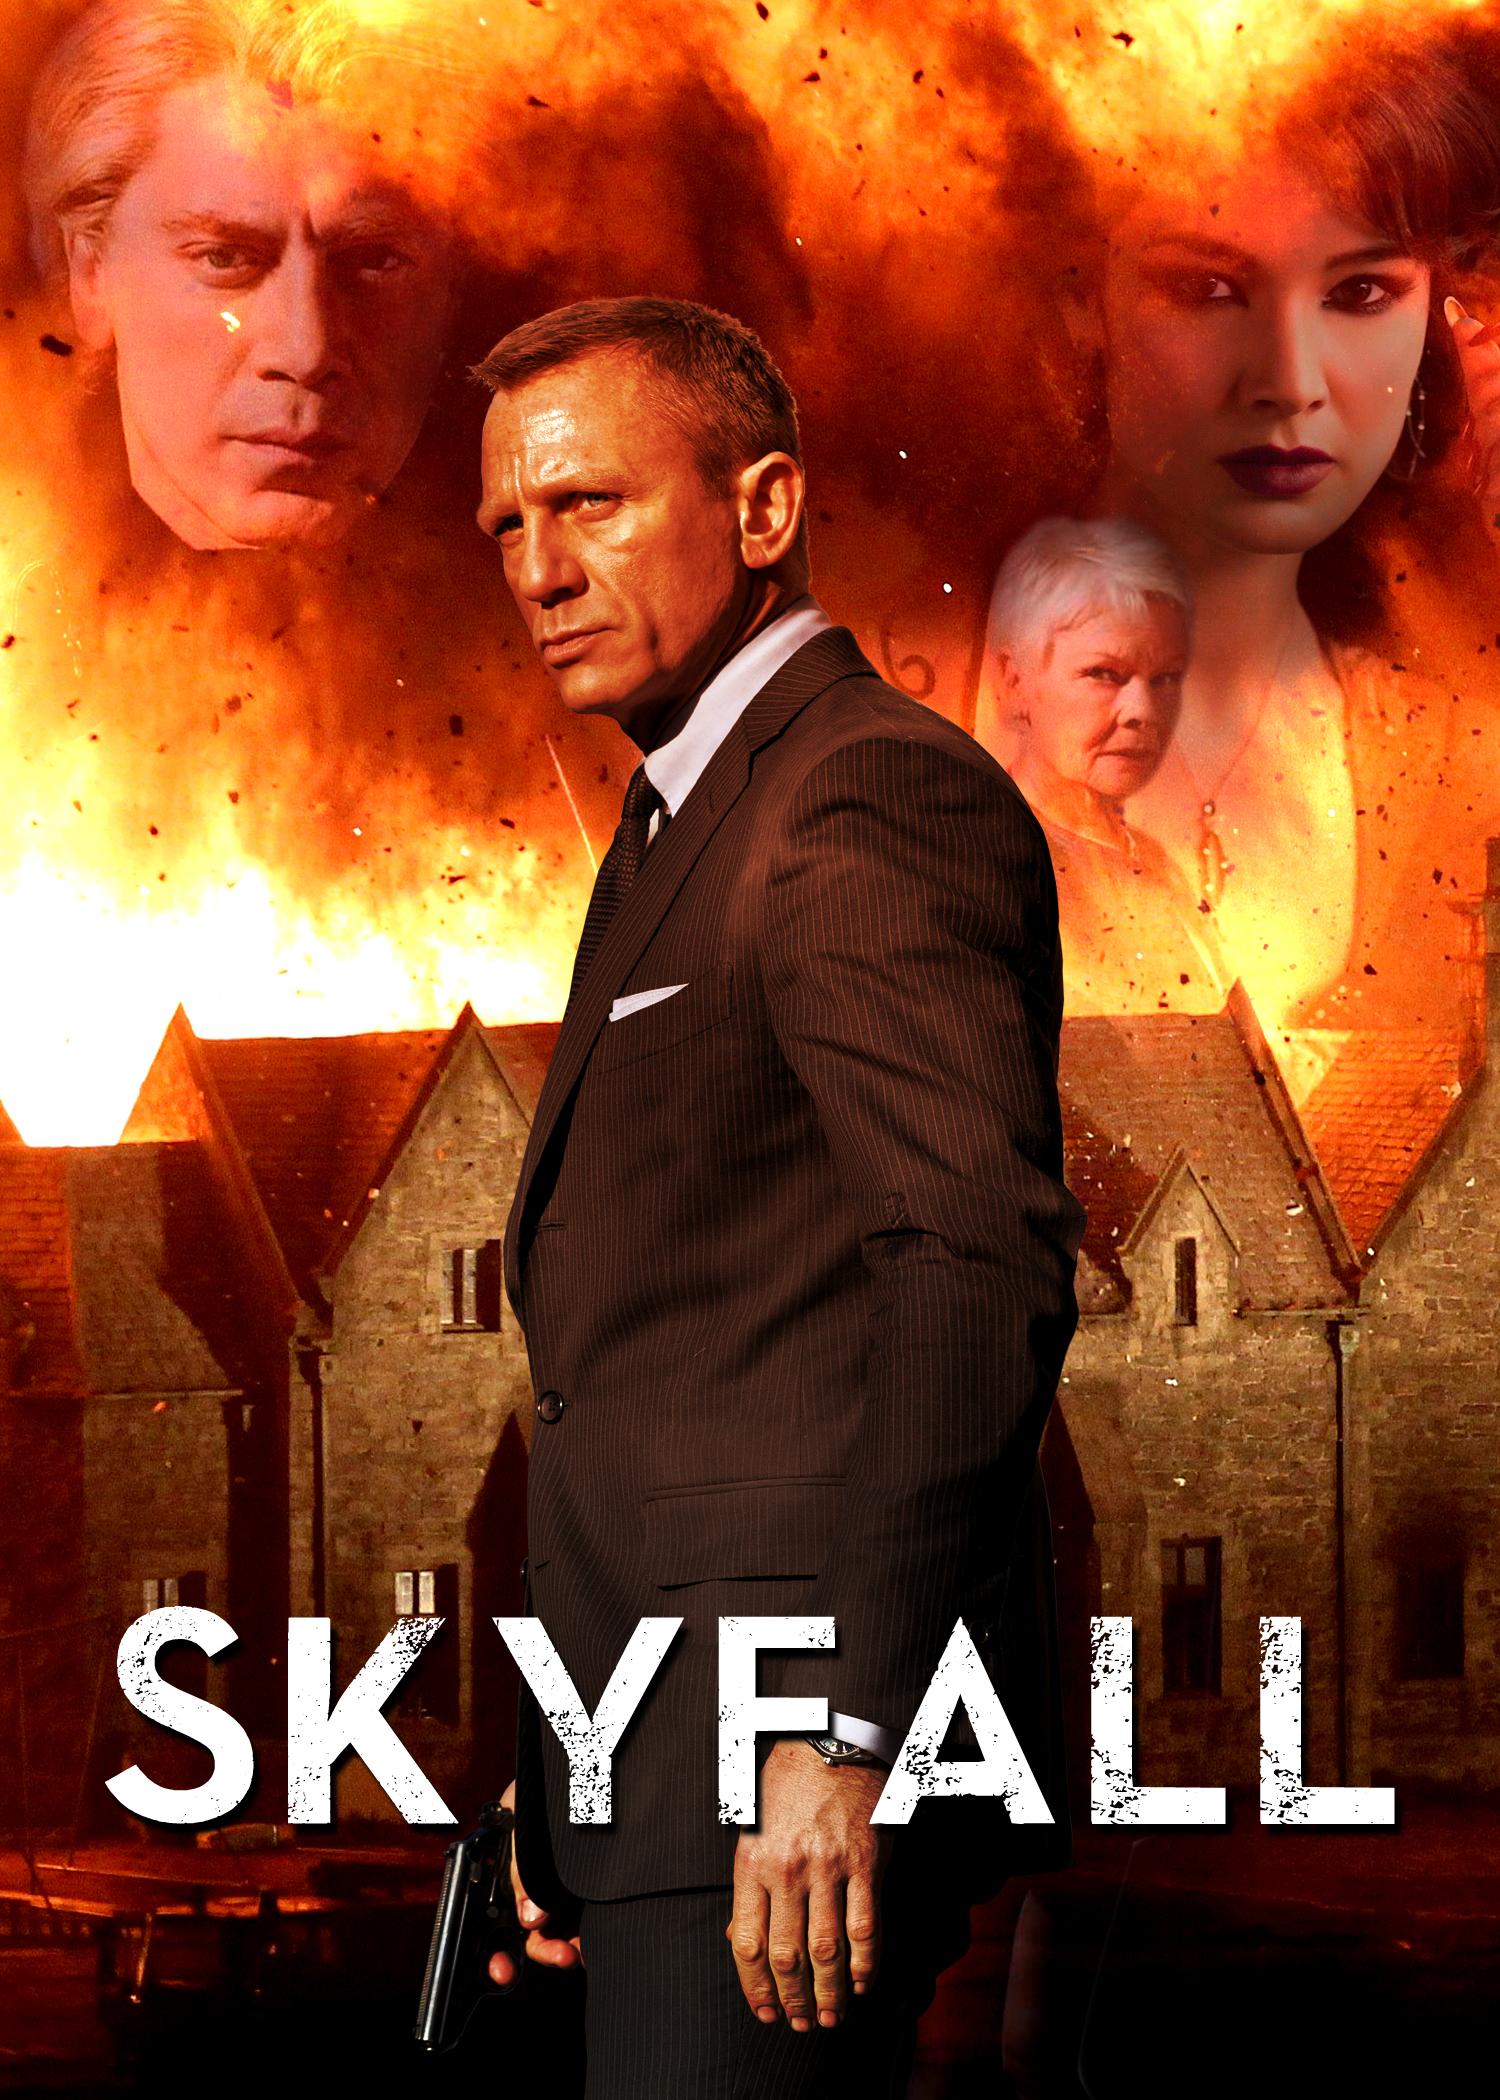 skyfall_poster_by_comandercool22-d6aicvb.jpg